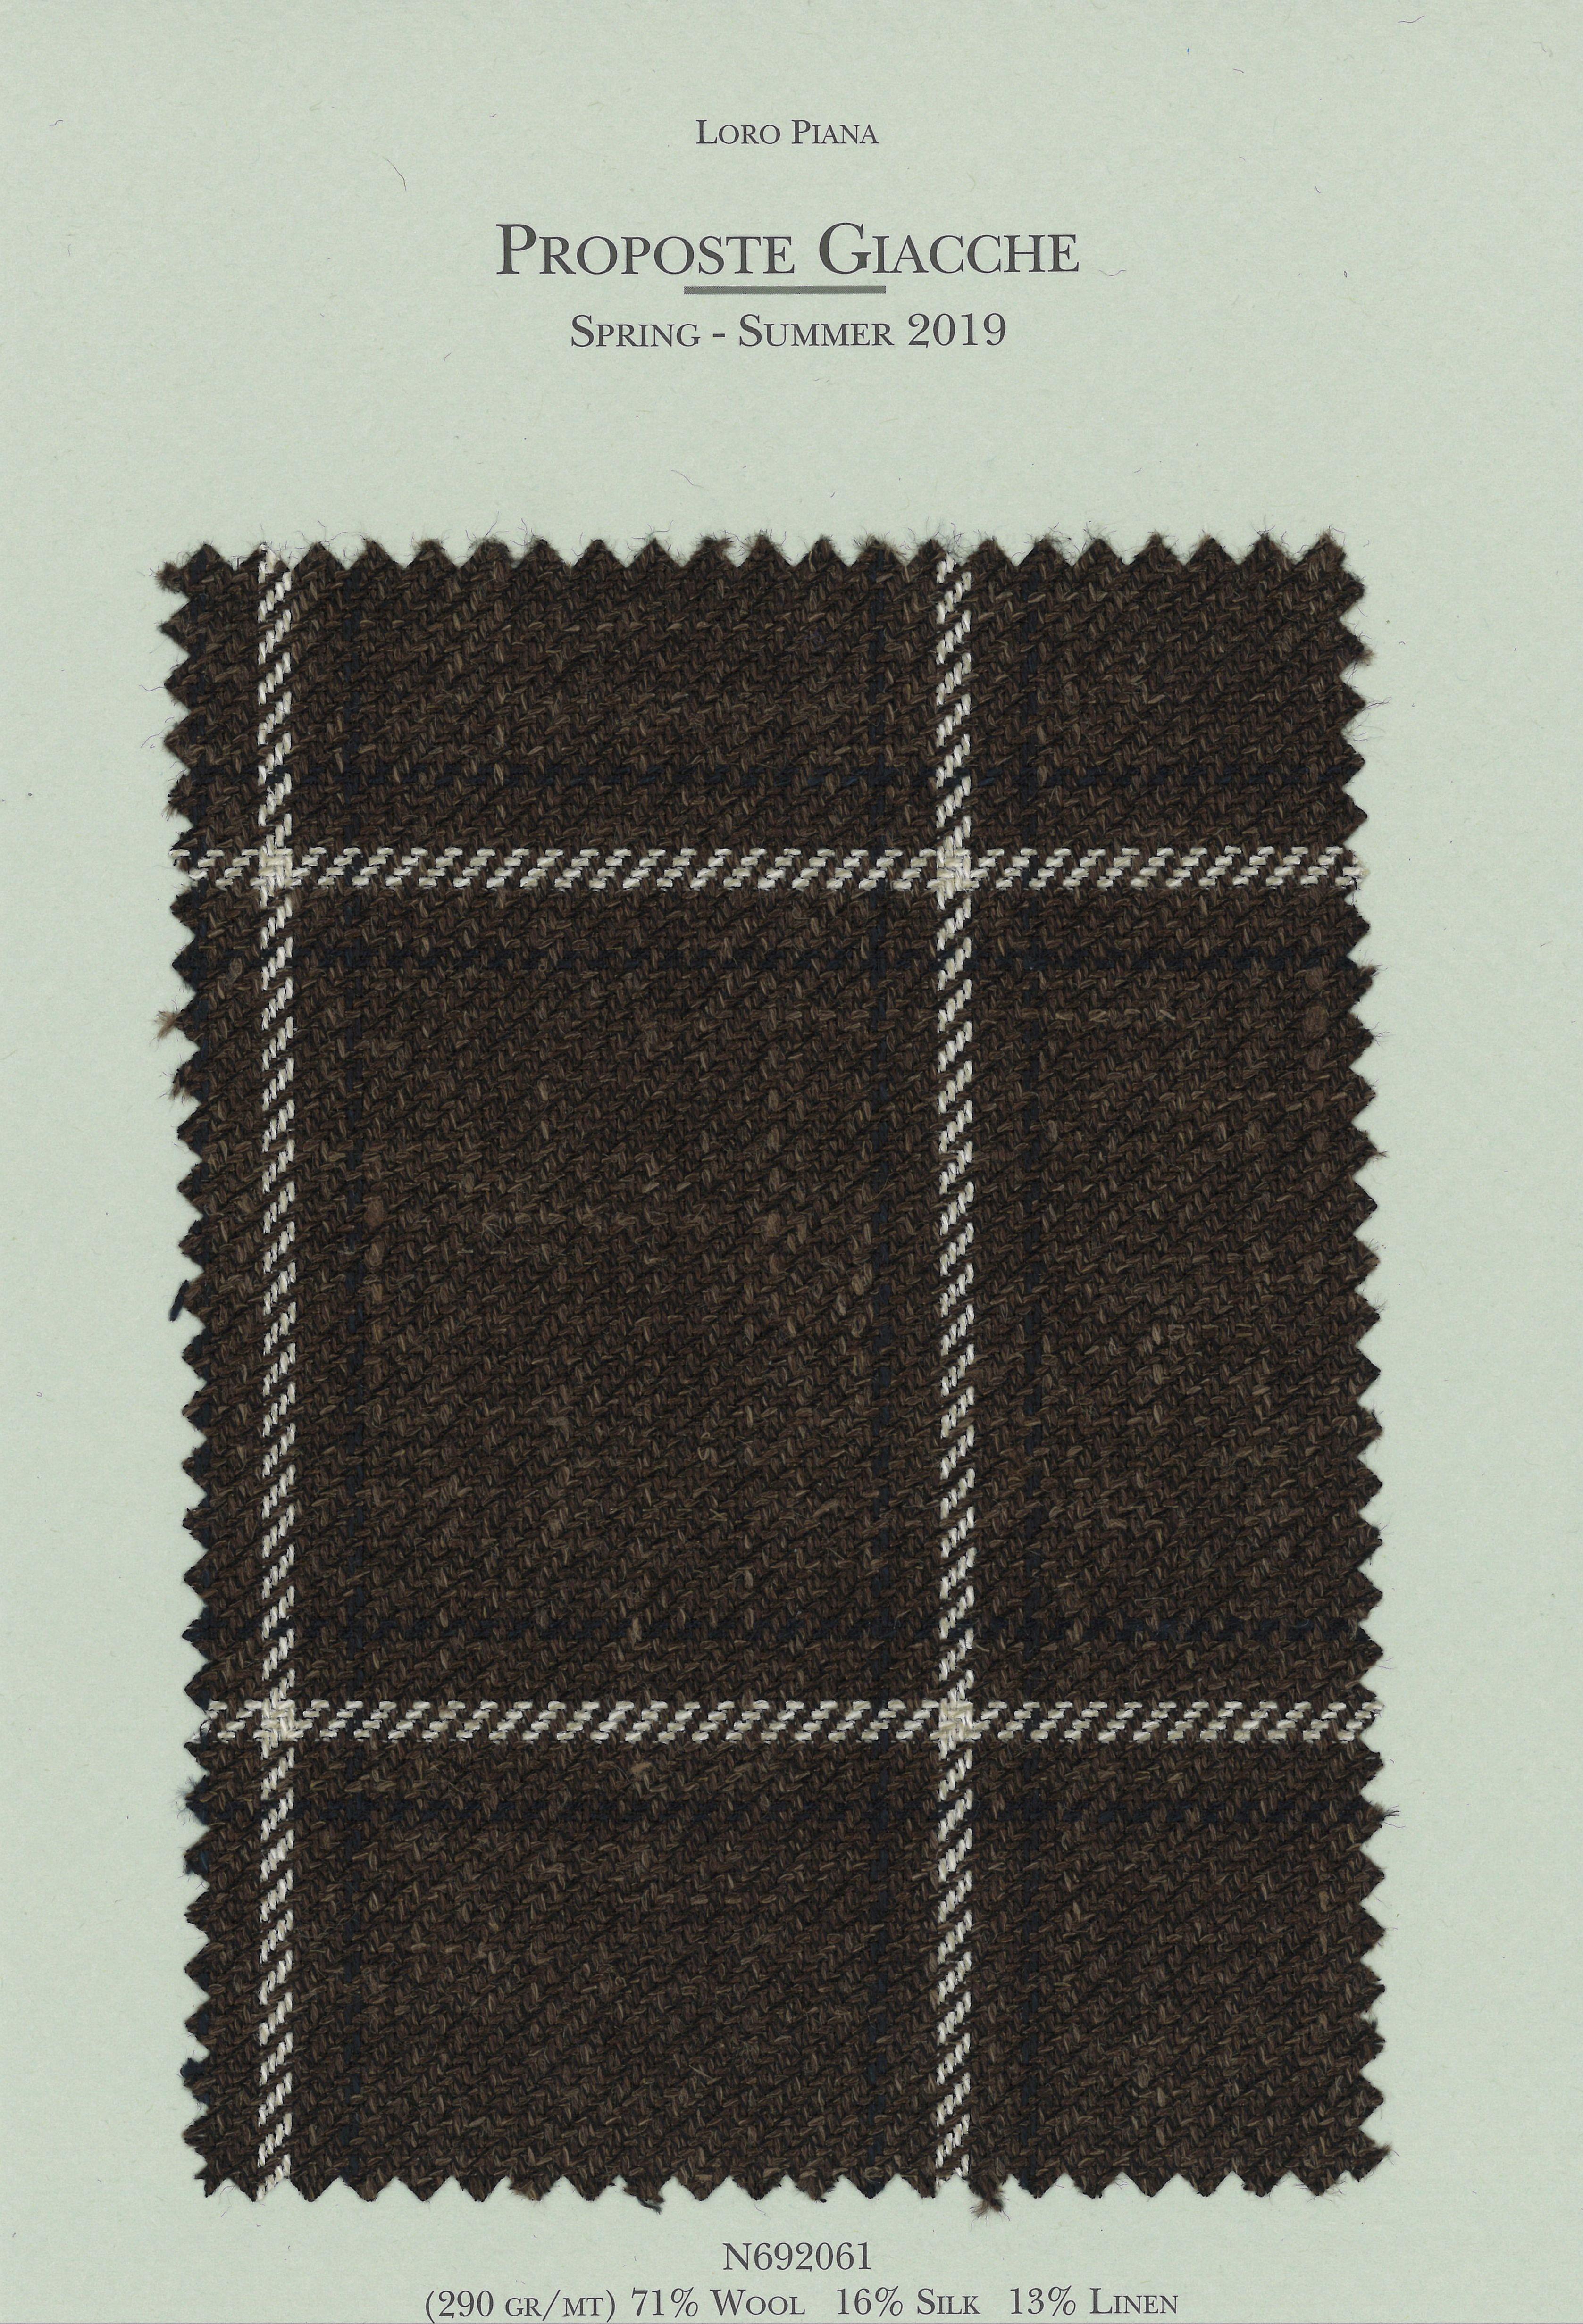 N692061